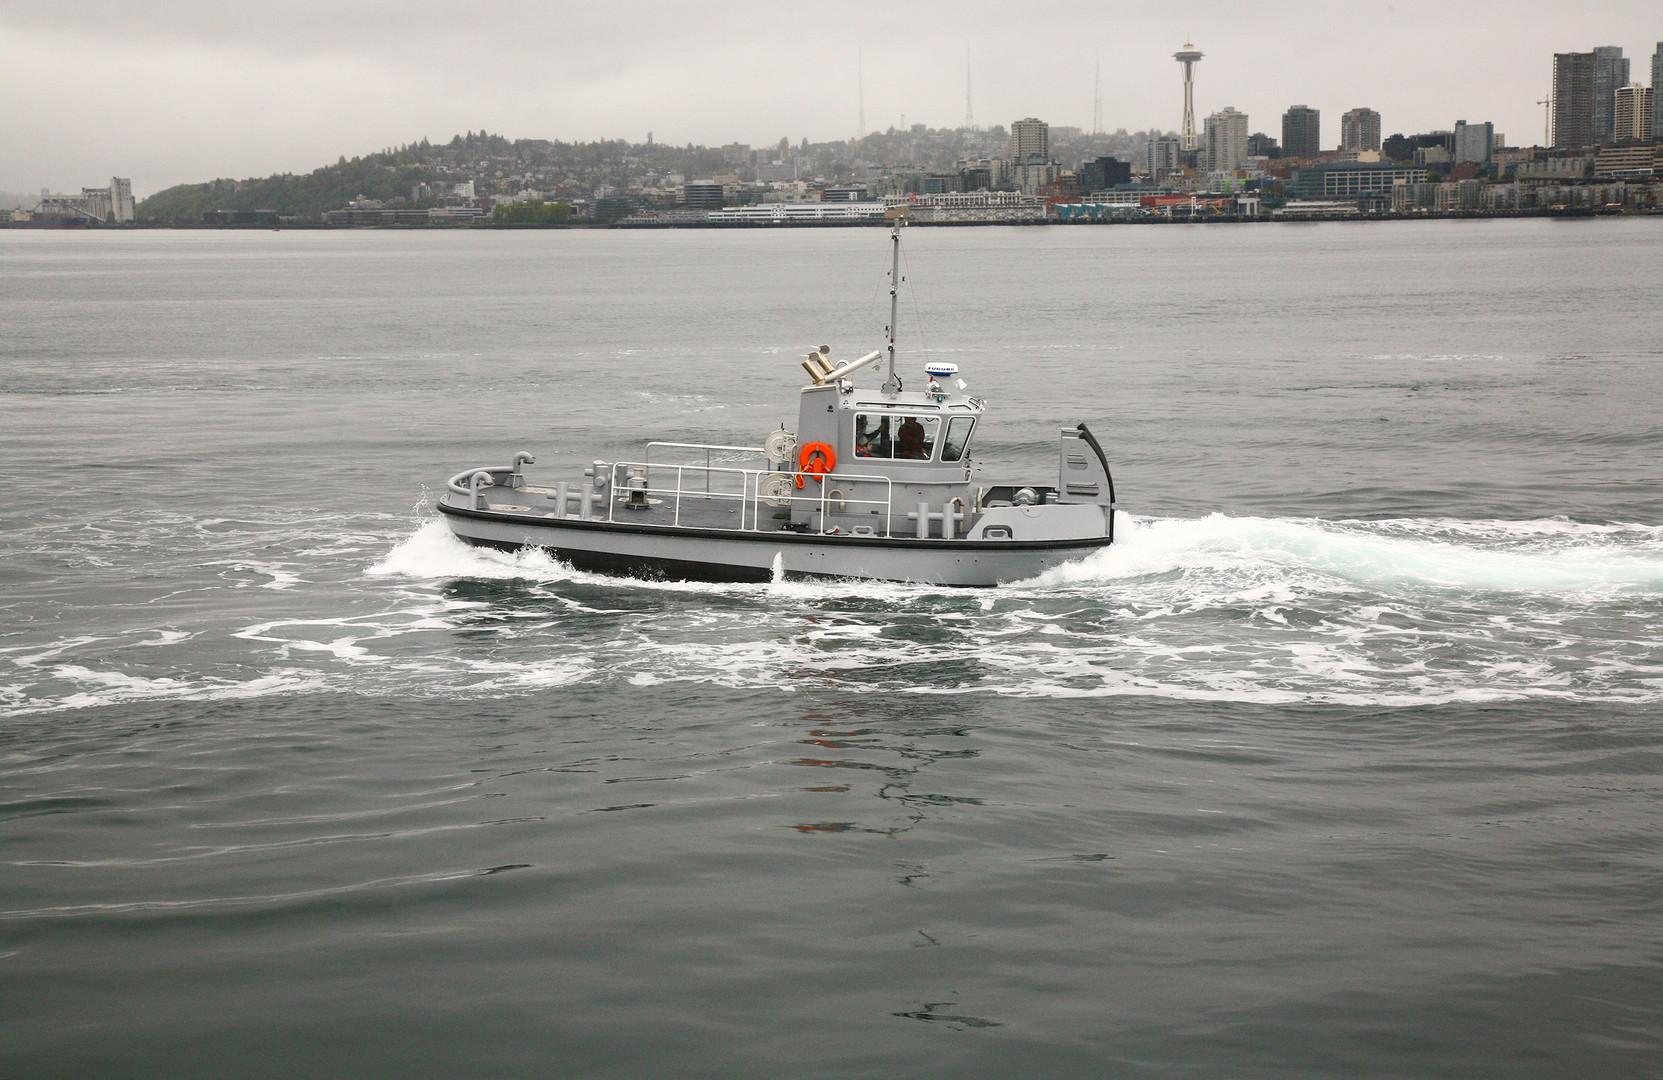 Workboat LG